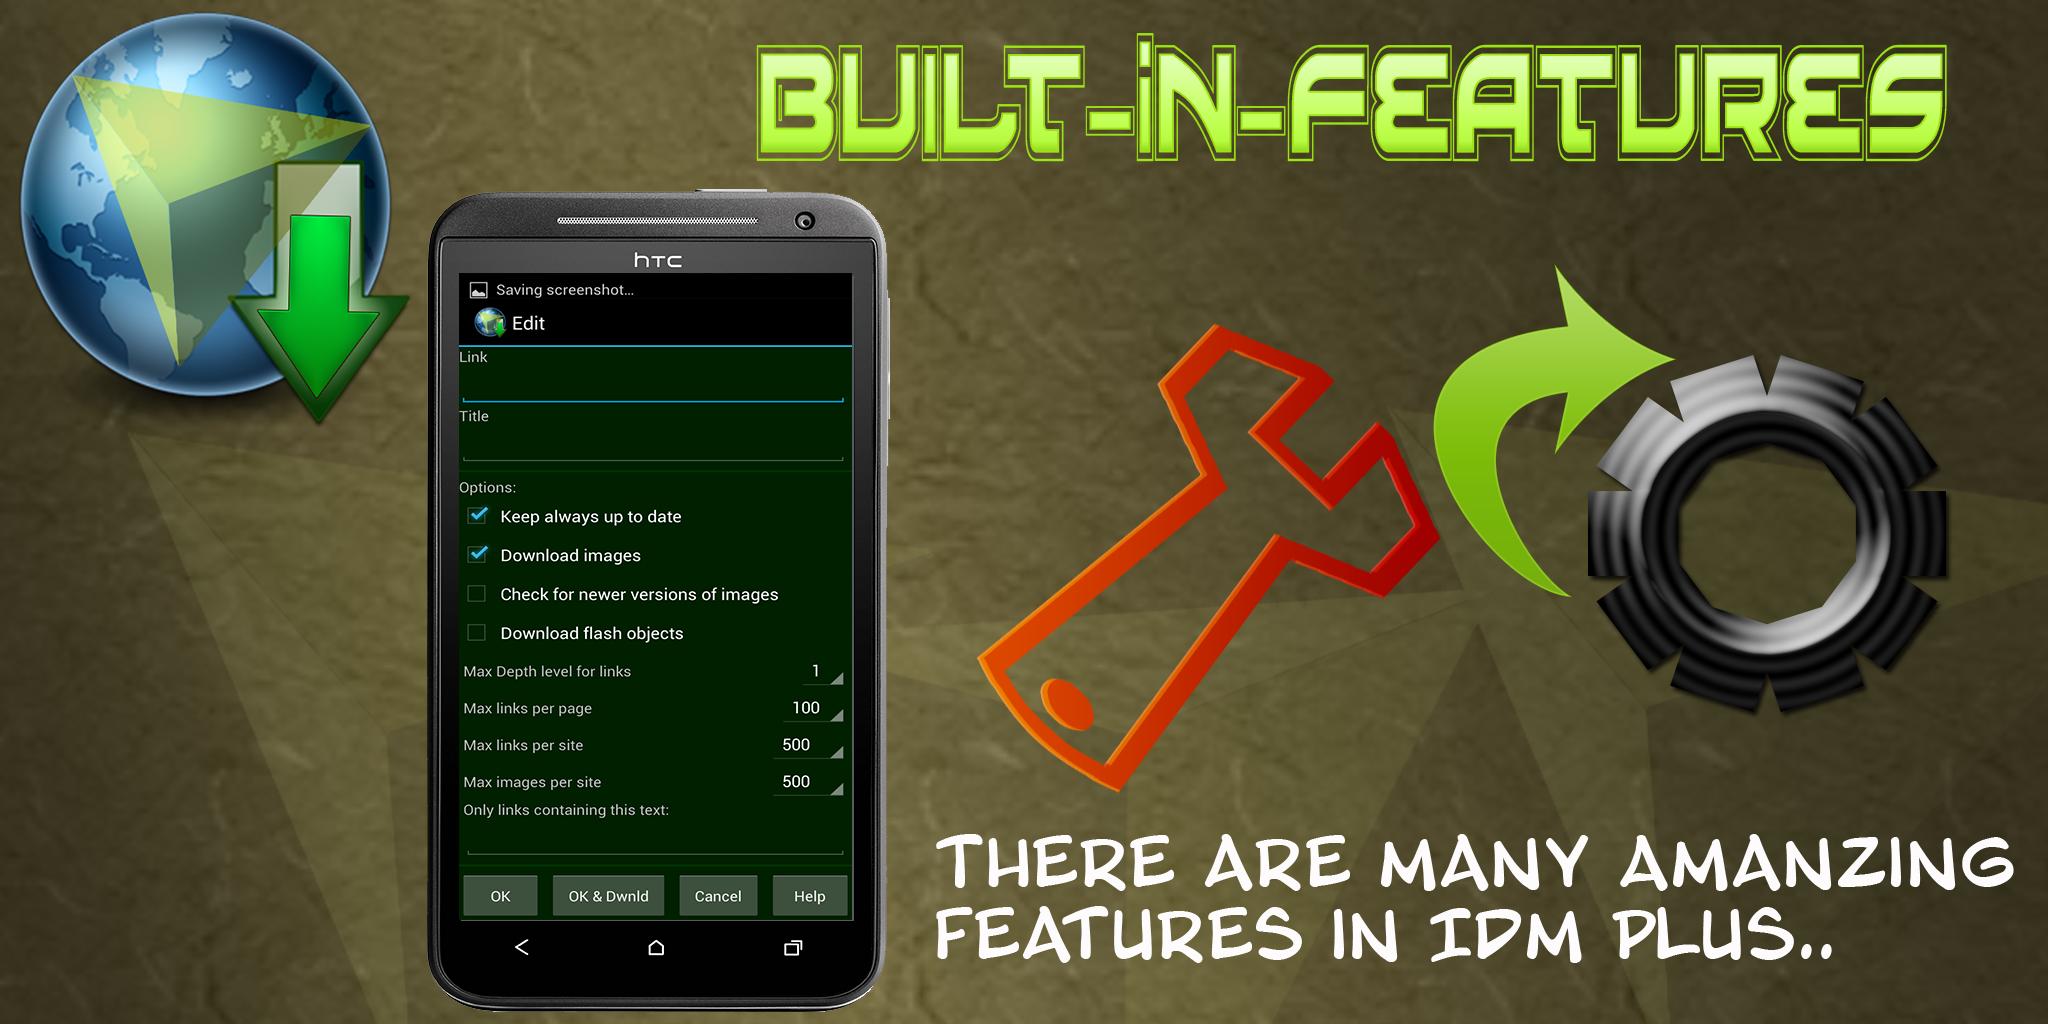 IDM Website Grabber Tool for Android - APK Download